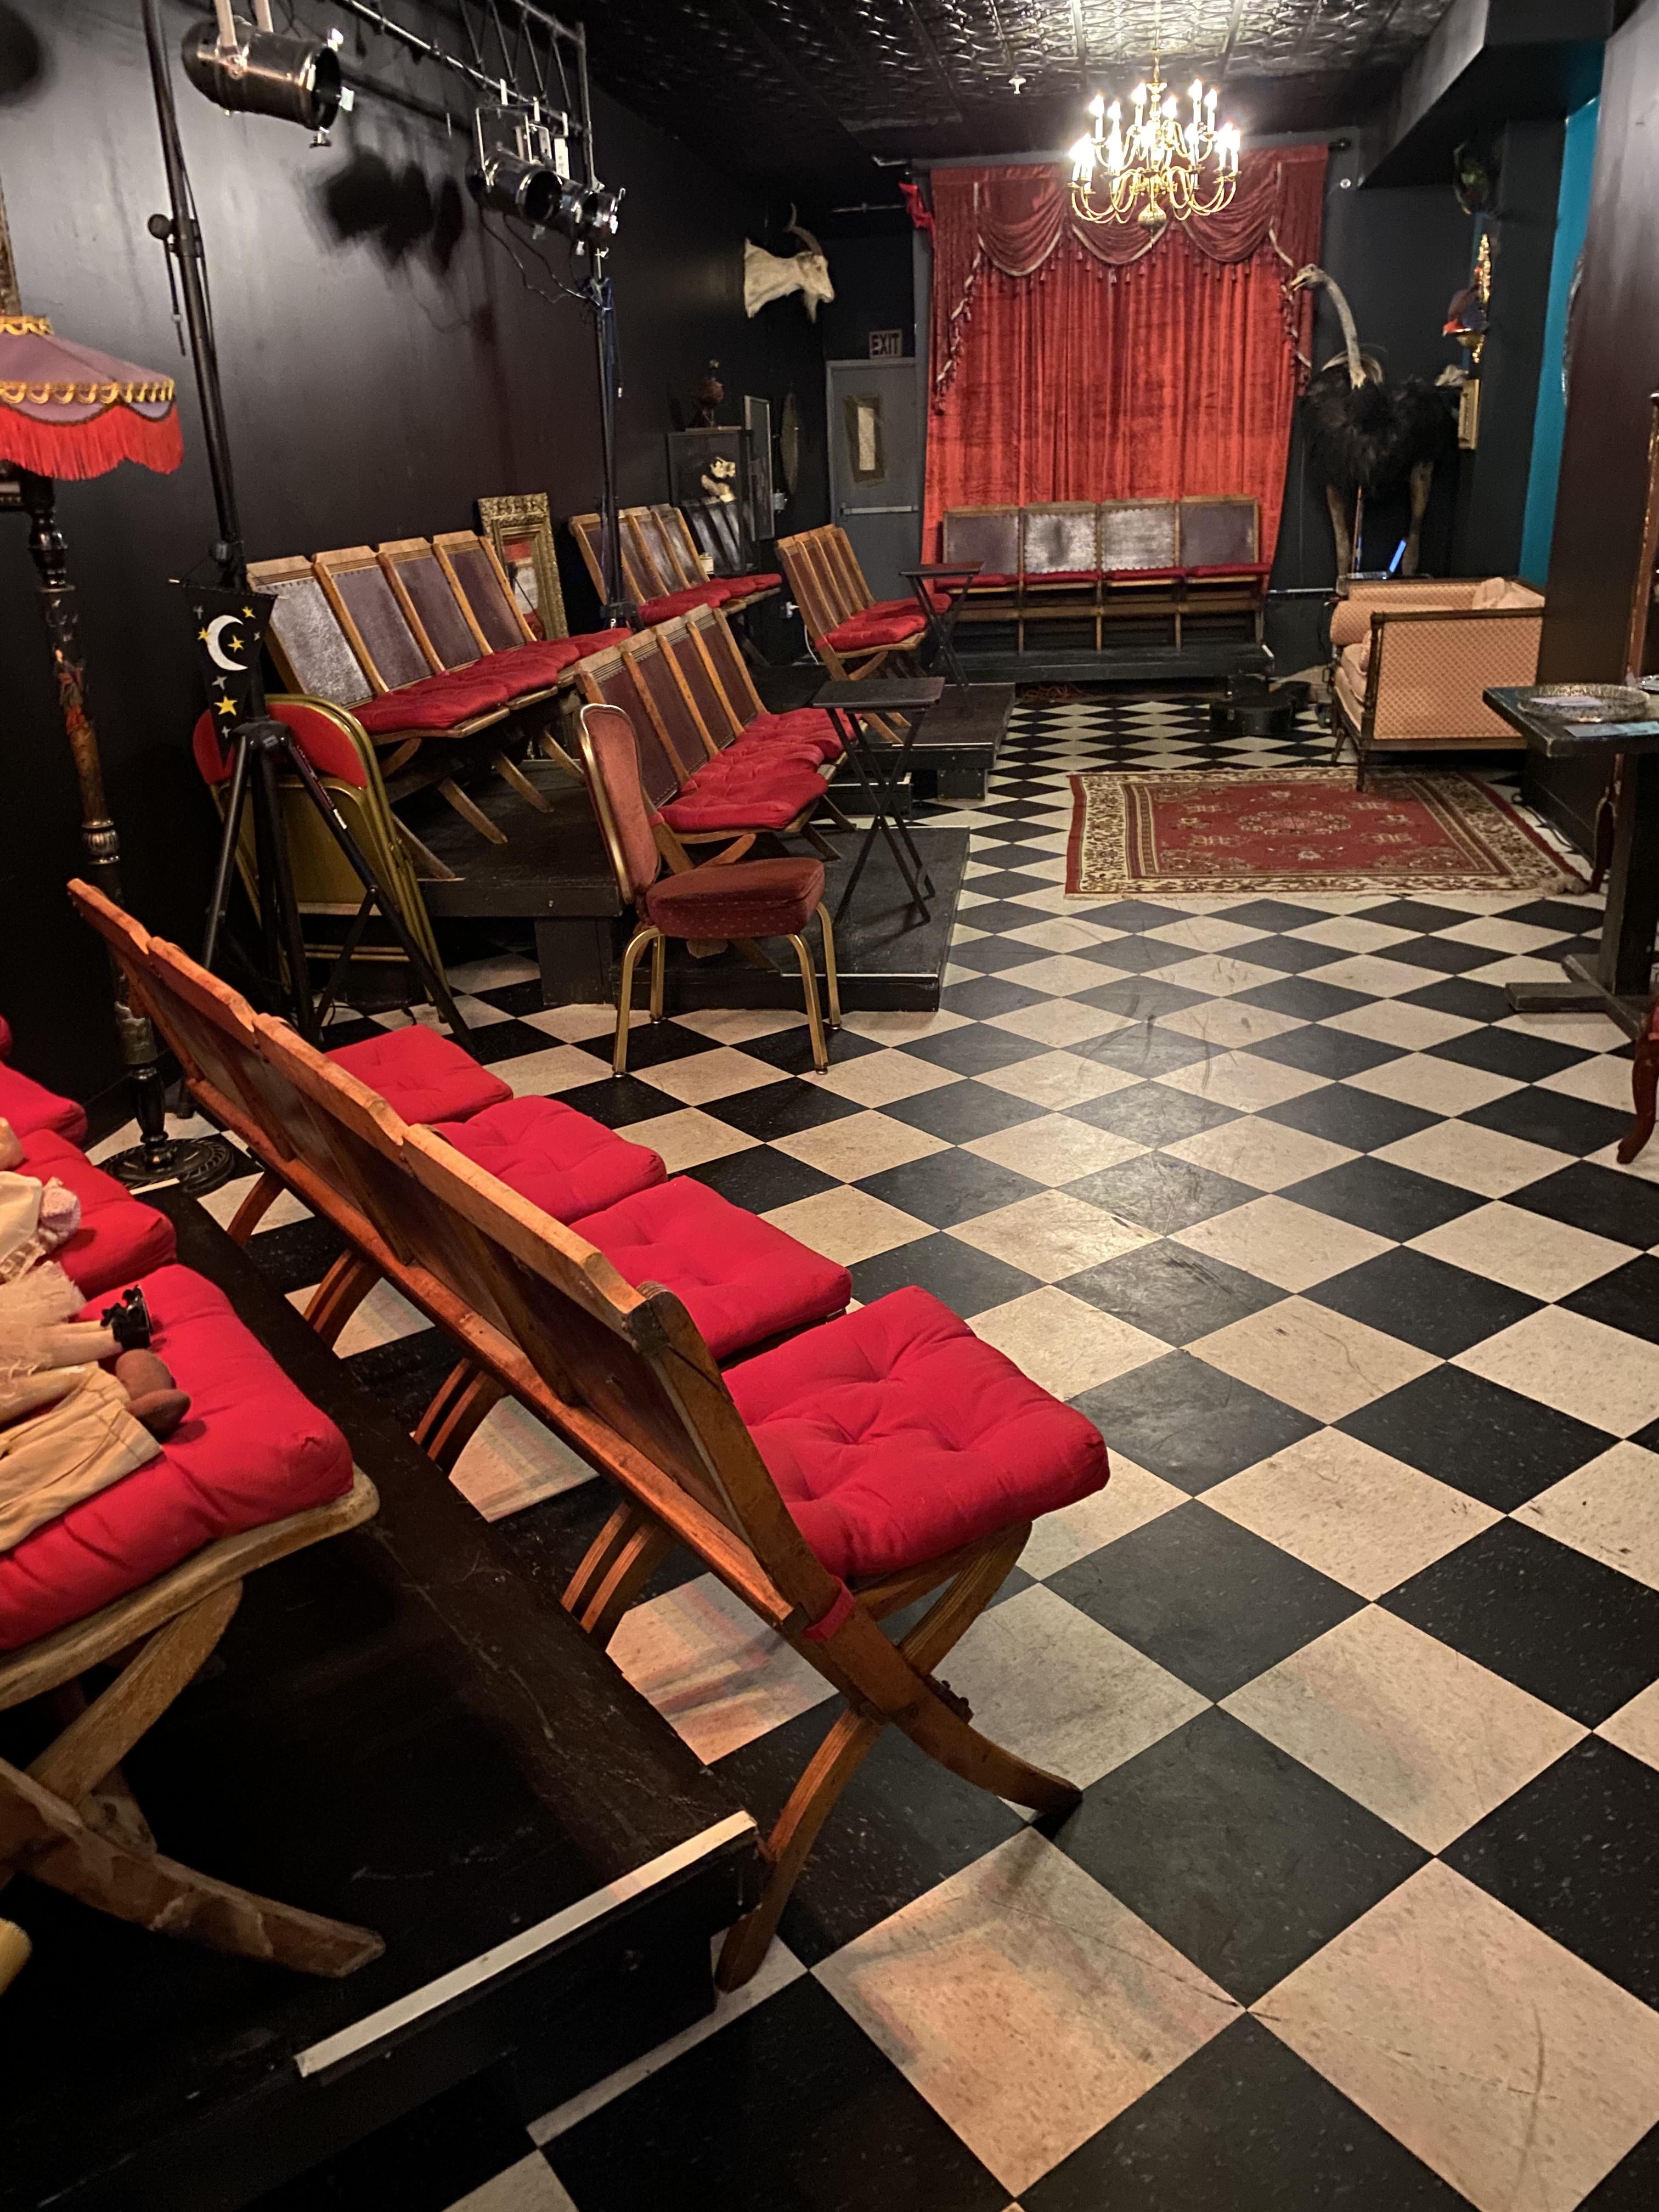 The Spirit Room: The Spirit Room's Conjure Box